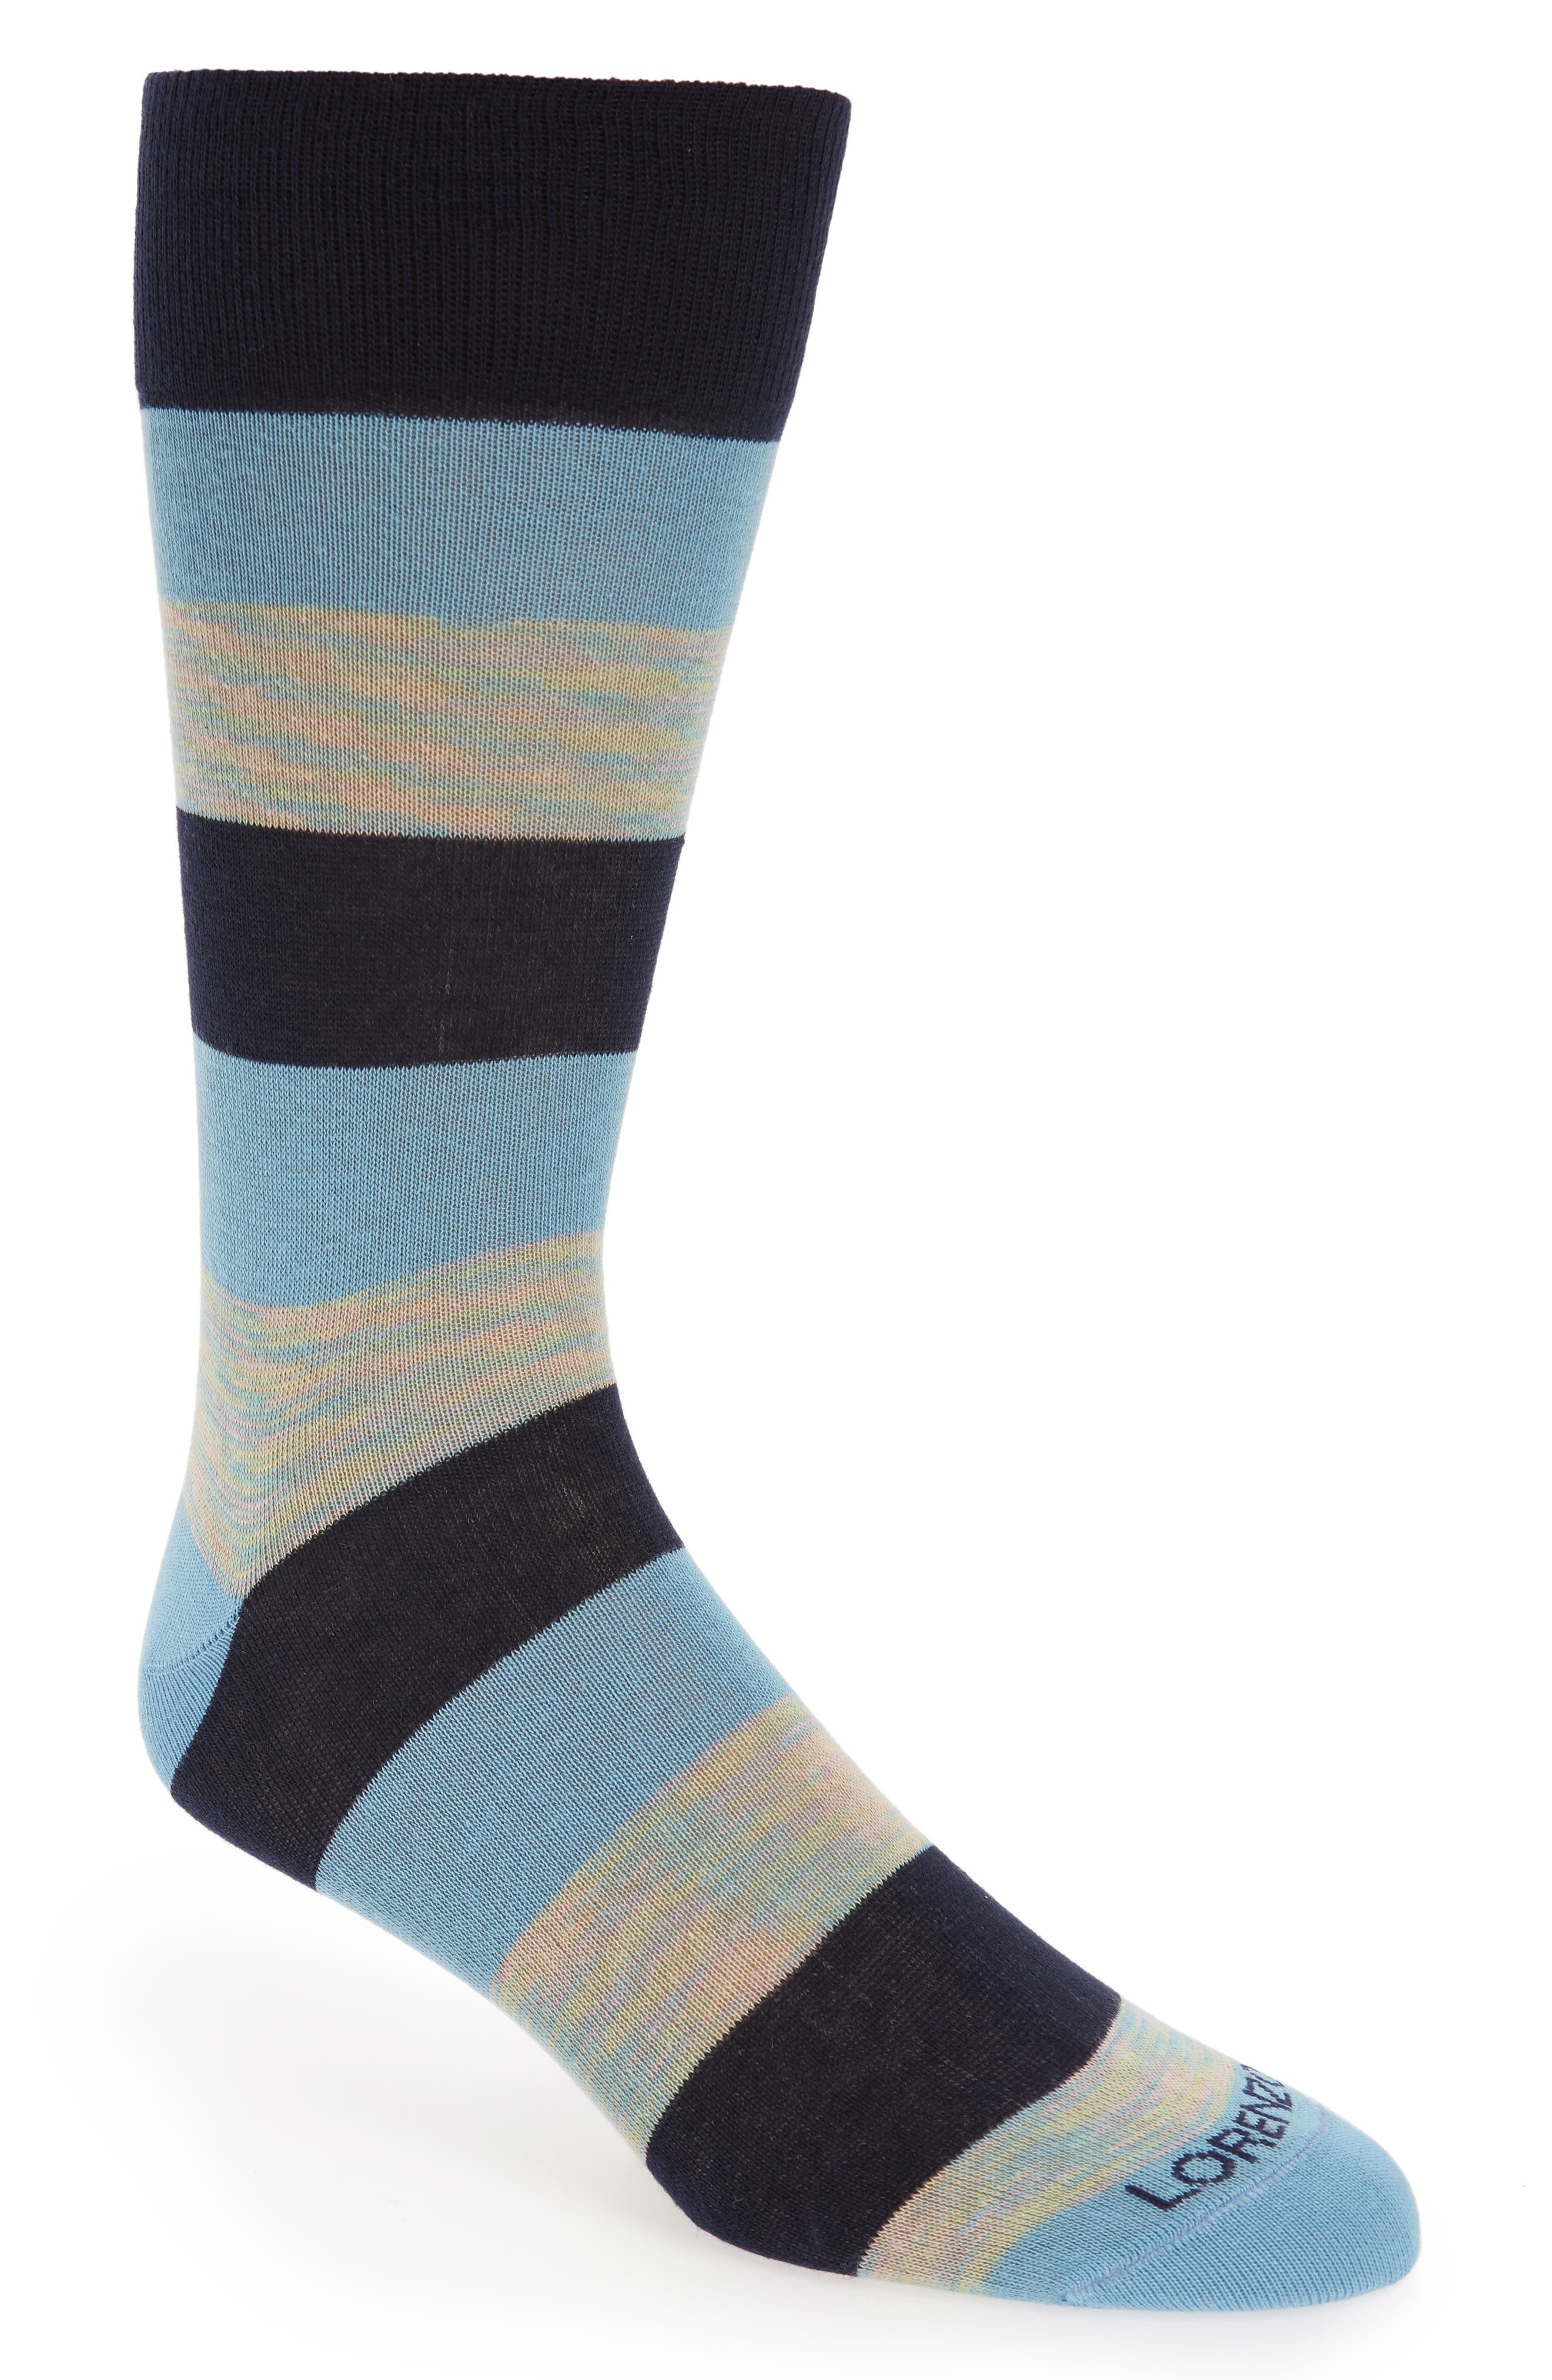 Lorenzo Uomo Rugby Stripe Socks (3 for $30)